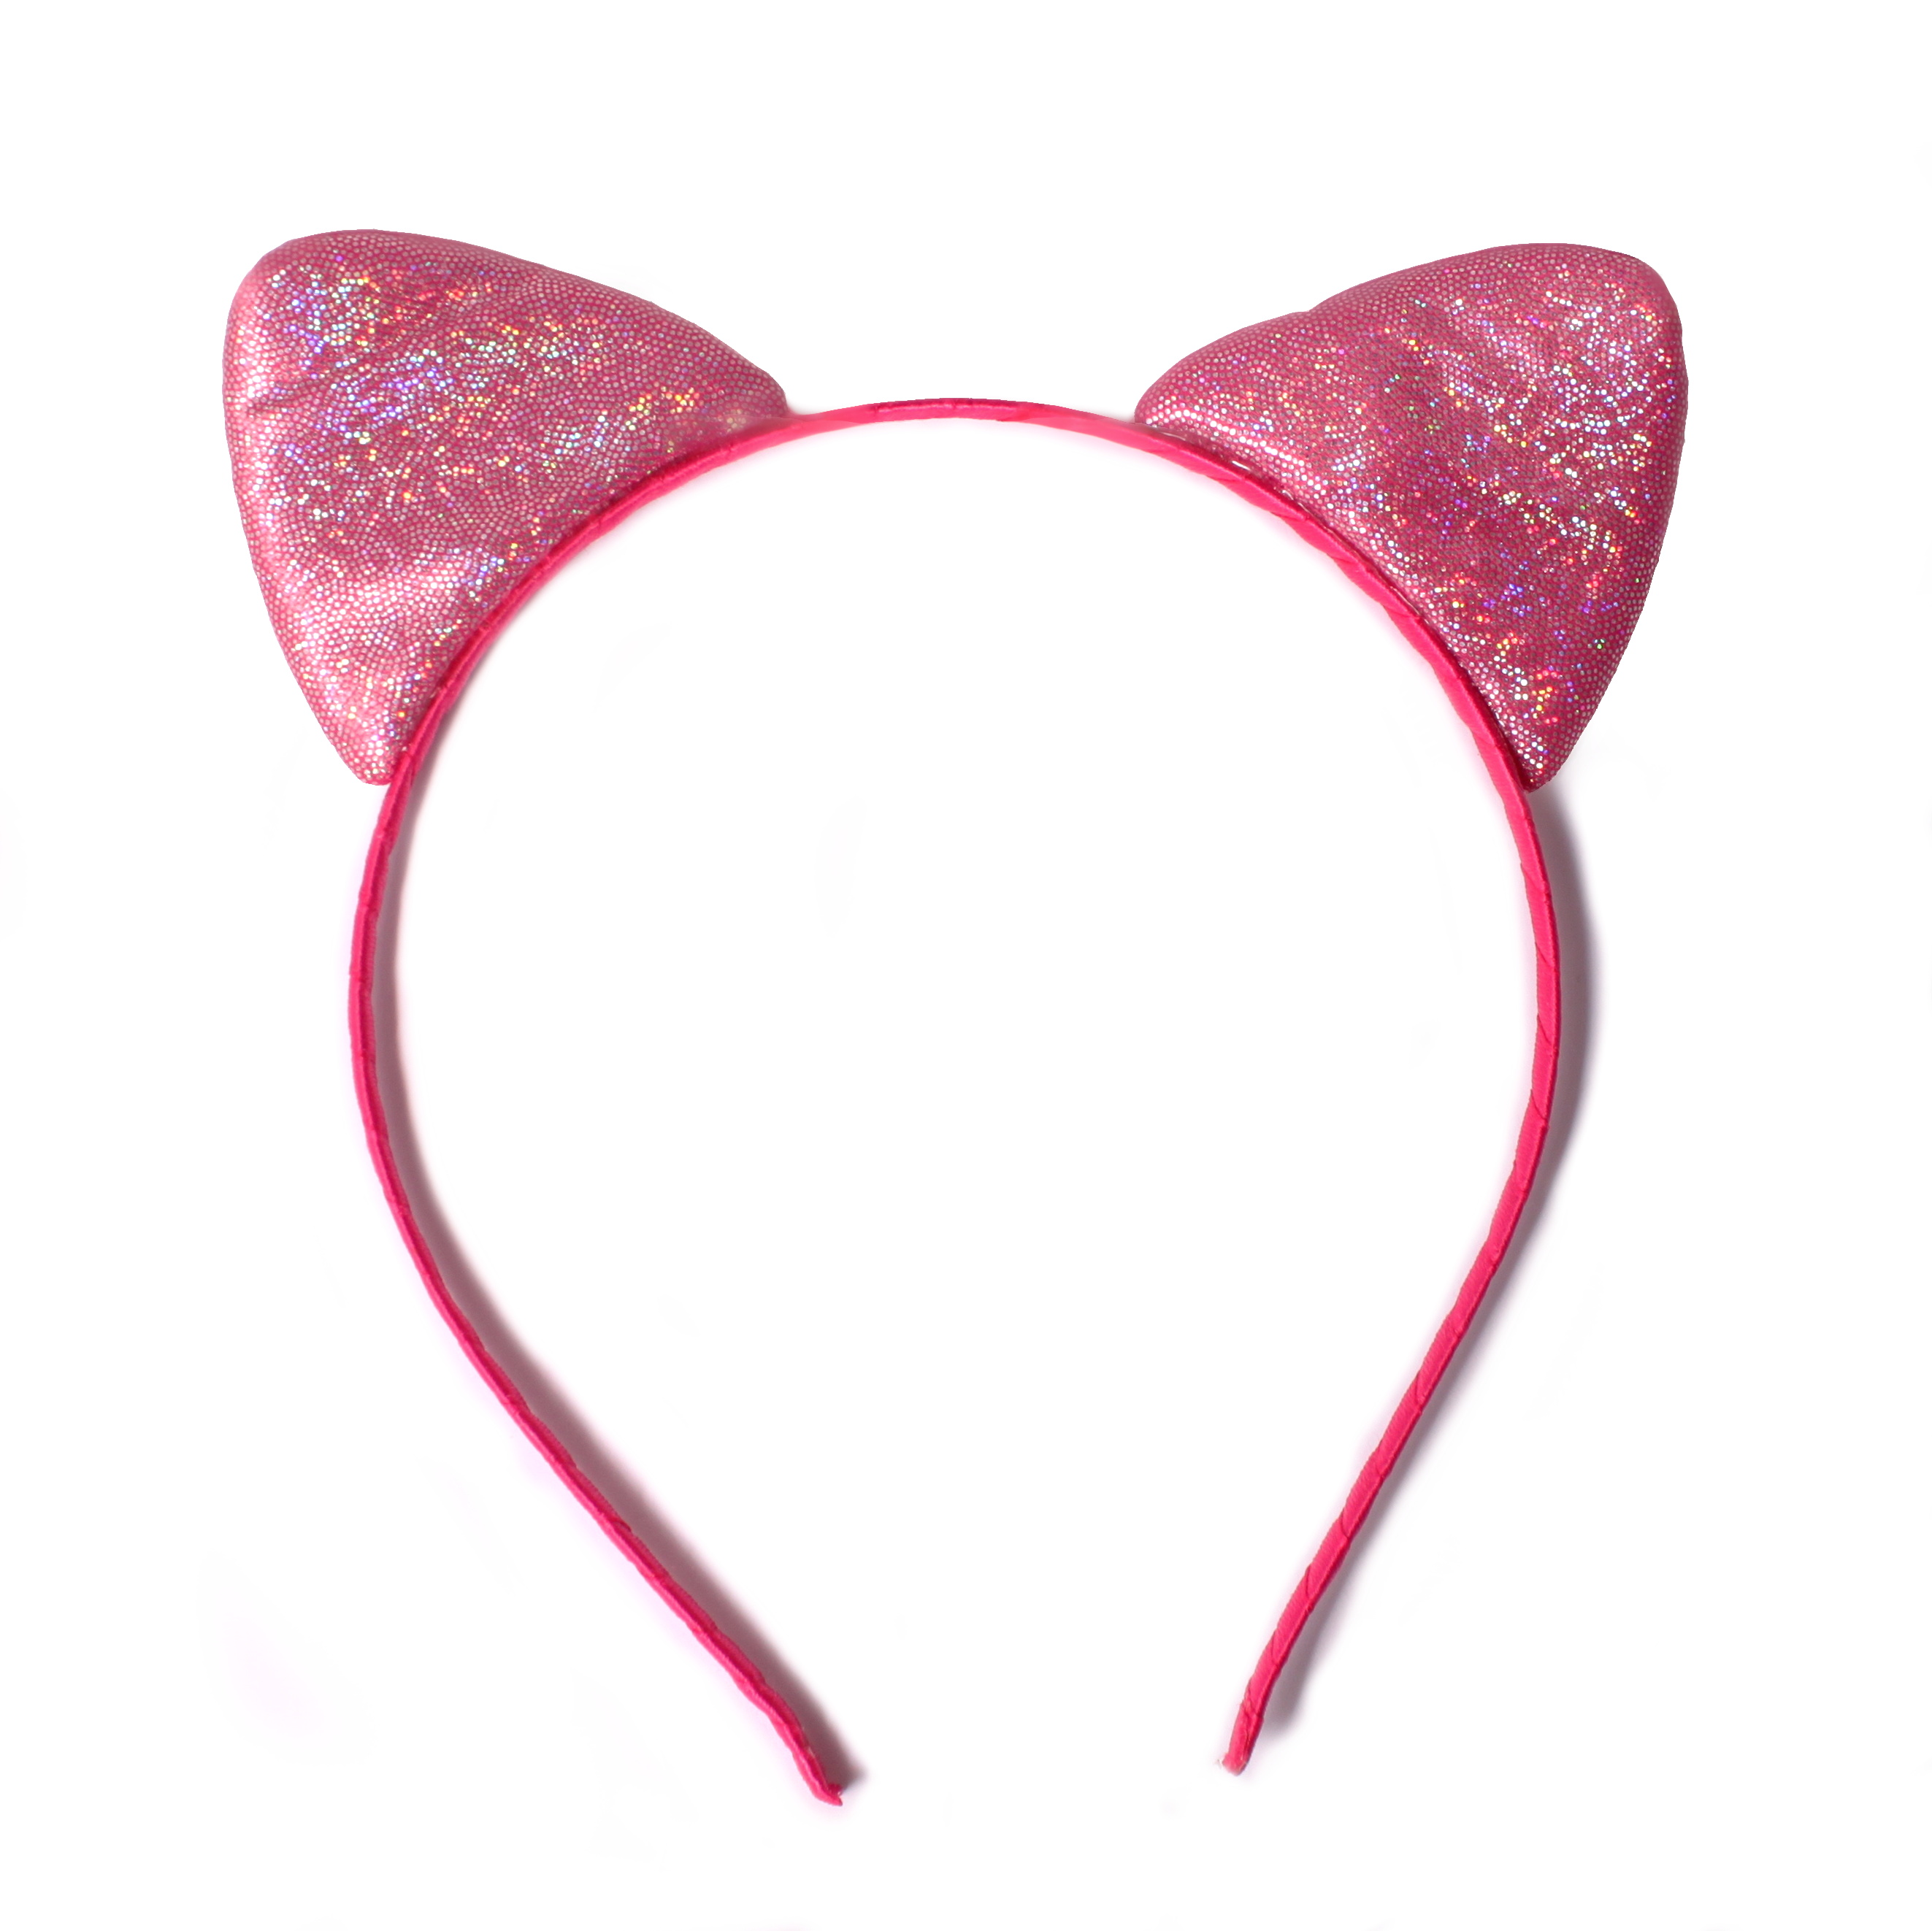 Hair-bizuterie Čelenka - kočičí uši Barva  tmavě růžová - Glami.cz eb8058d332